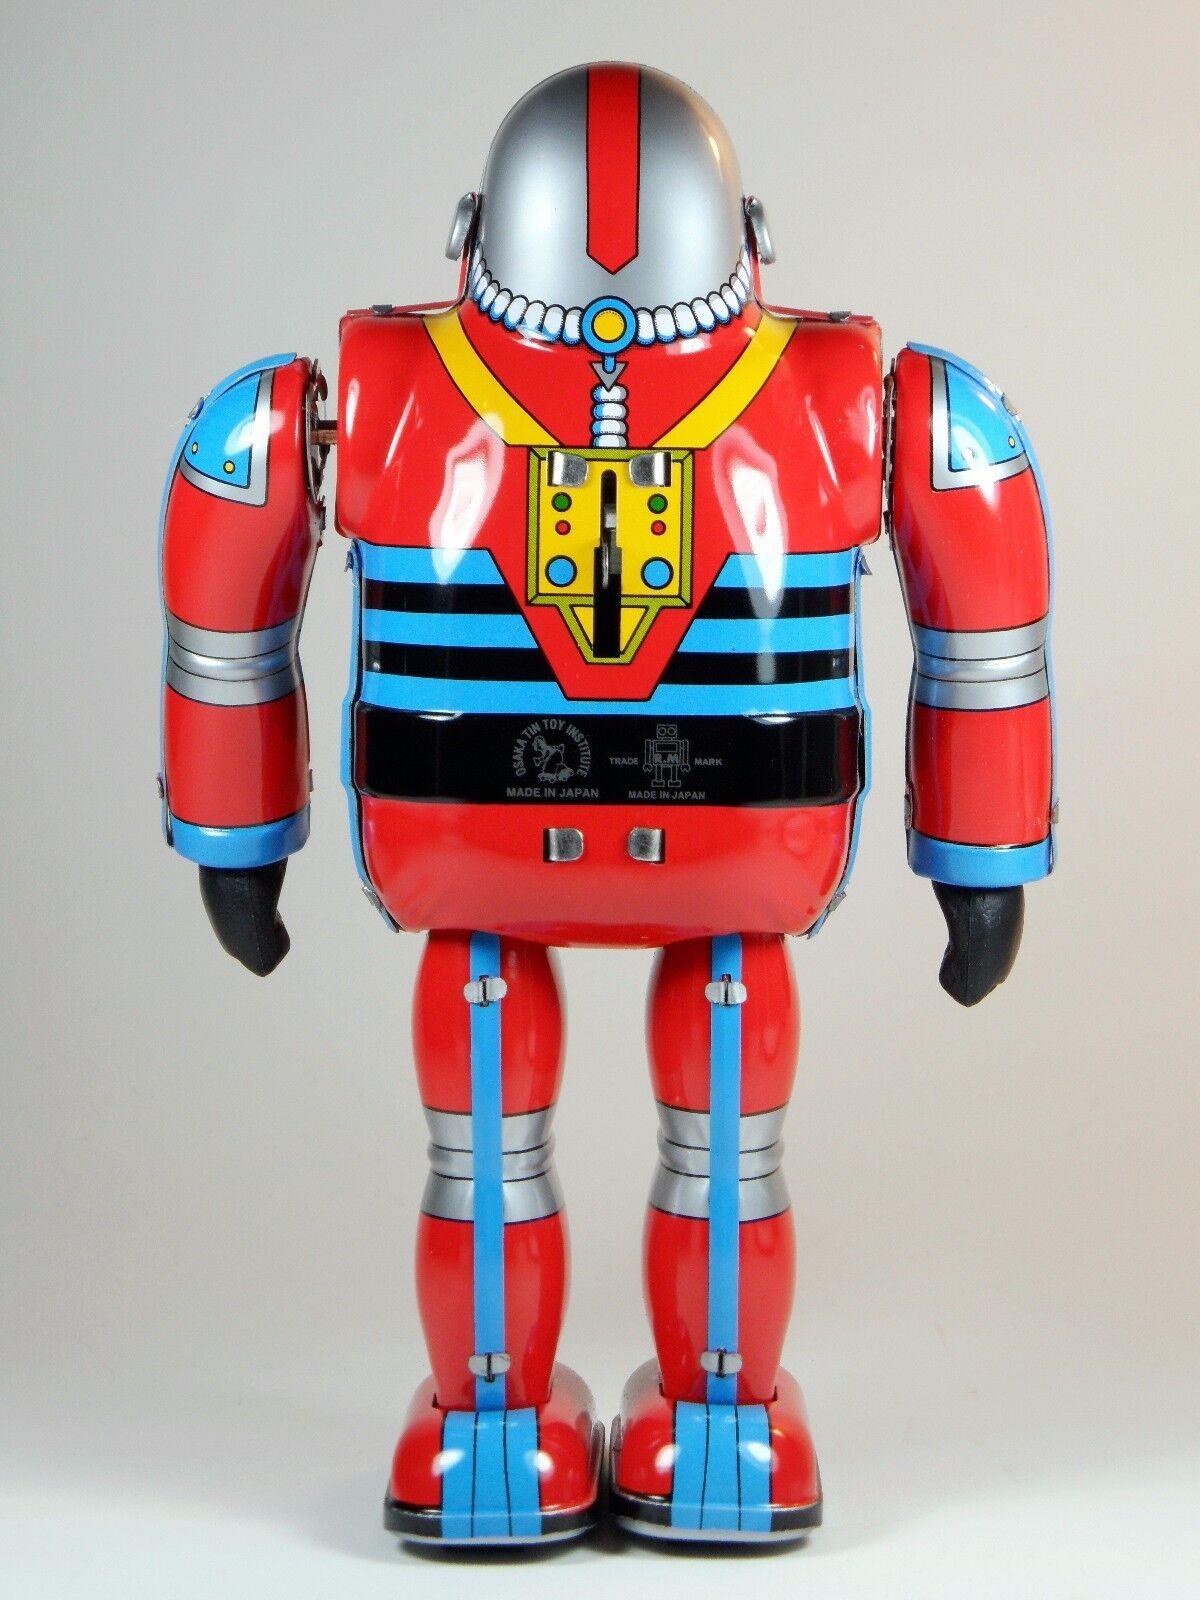 Astronauta japonés Juguete De Hojalata Litografiada Coleccionistas Juguete Nuevo en Caja Osaka Estaño Juguete Inst.